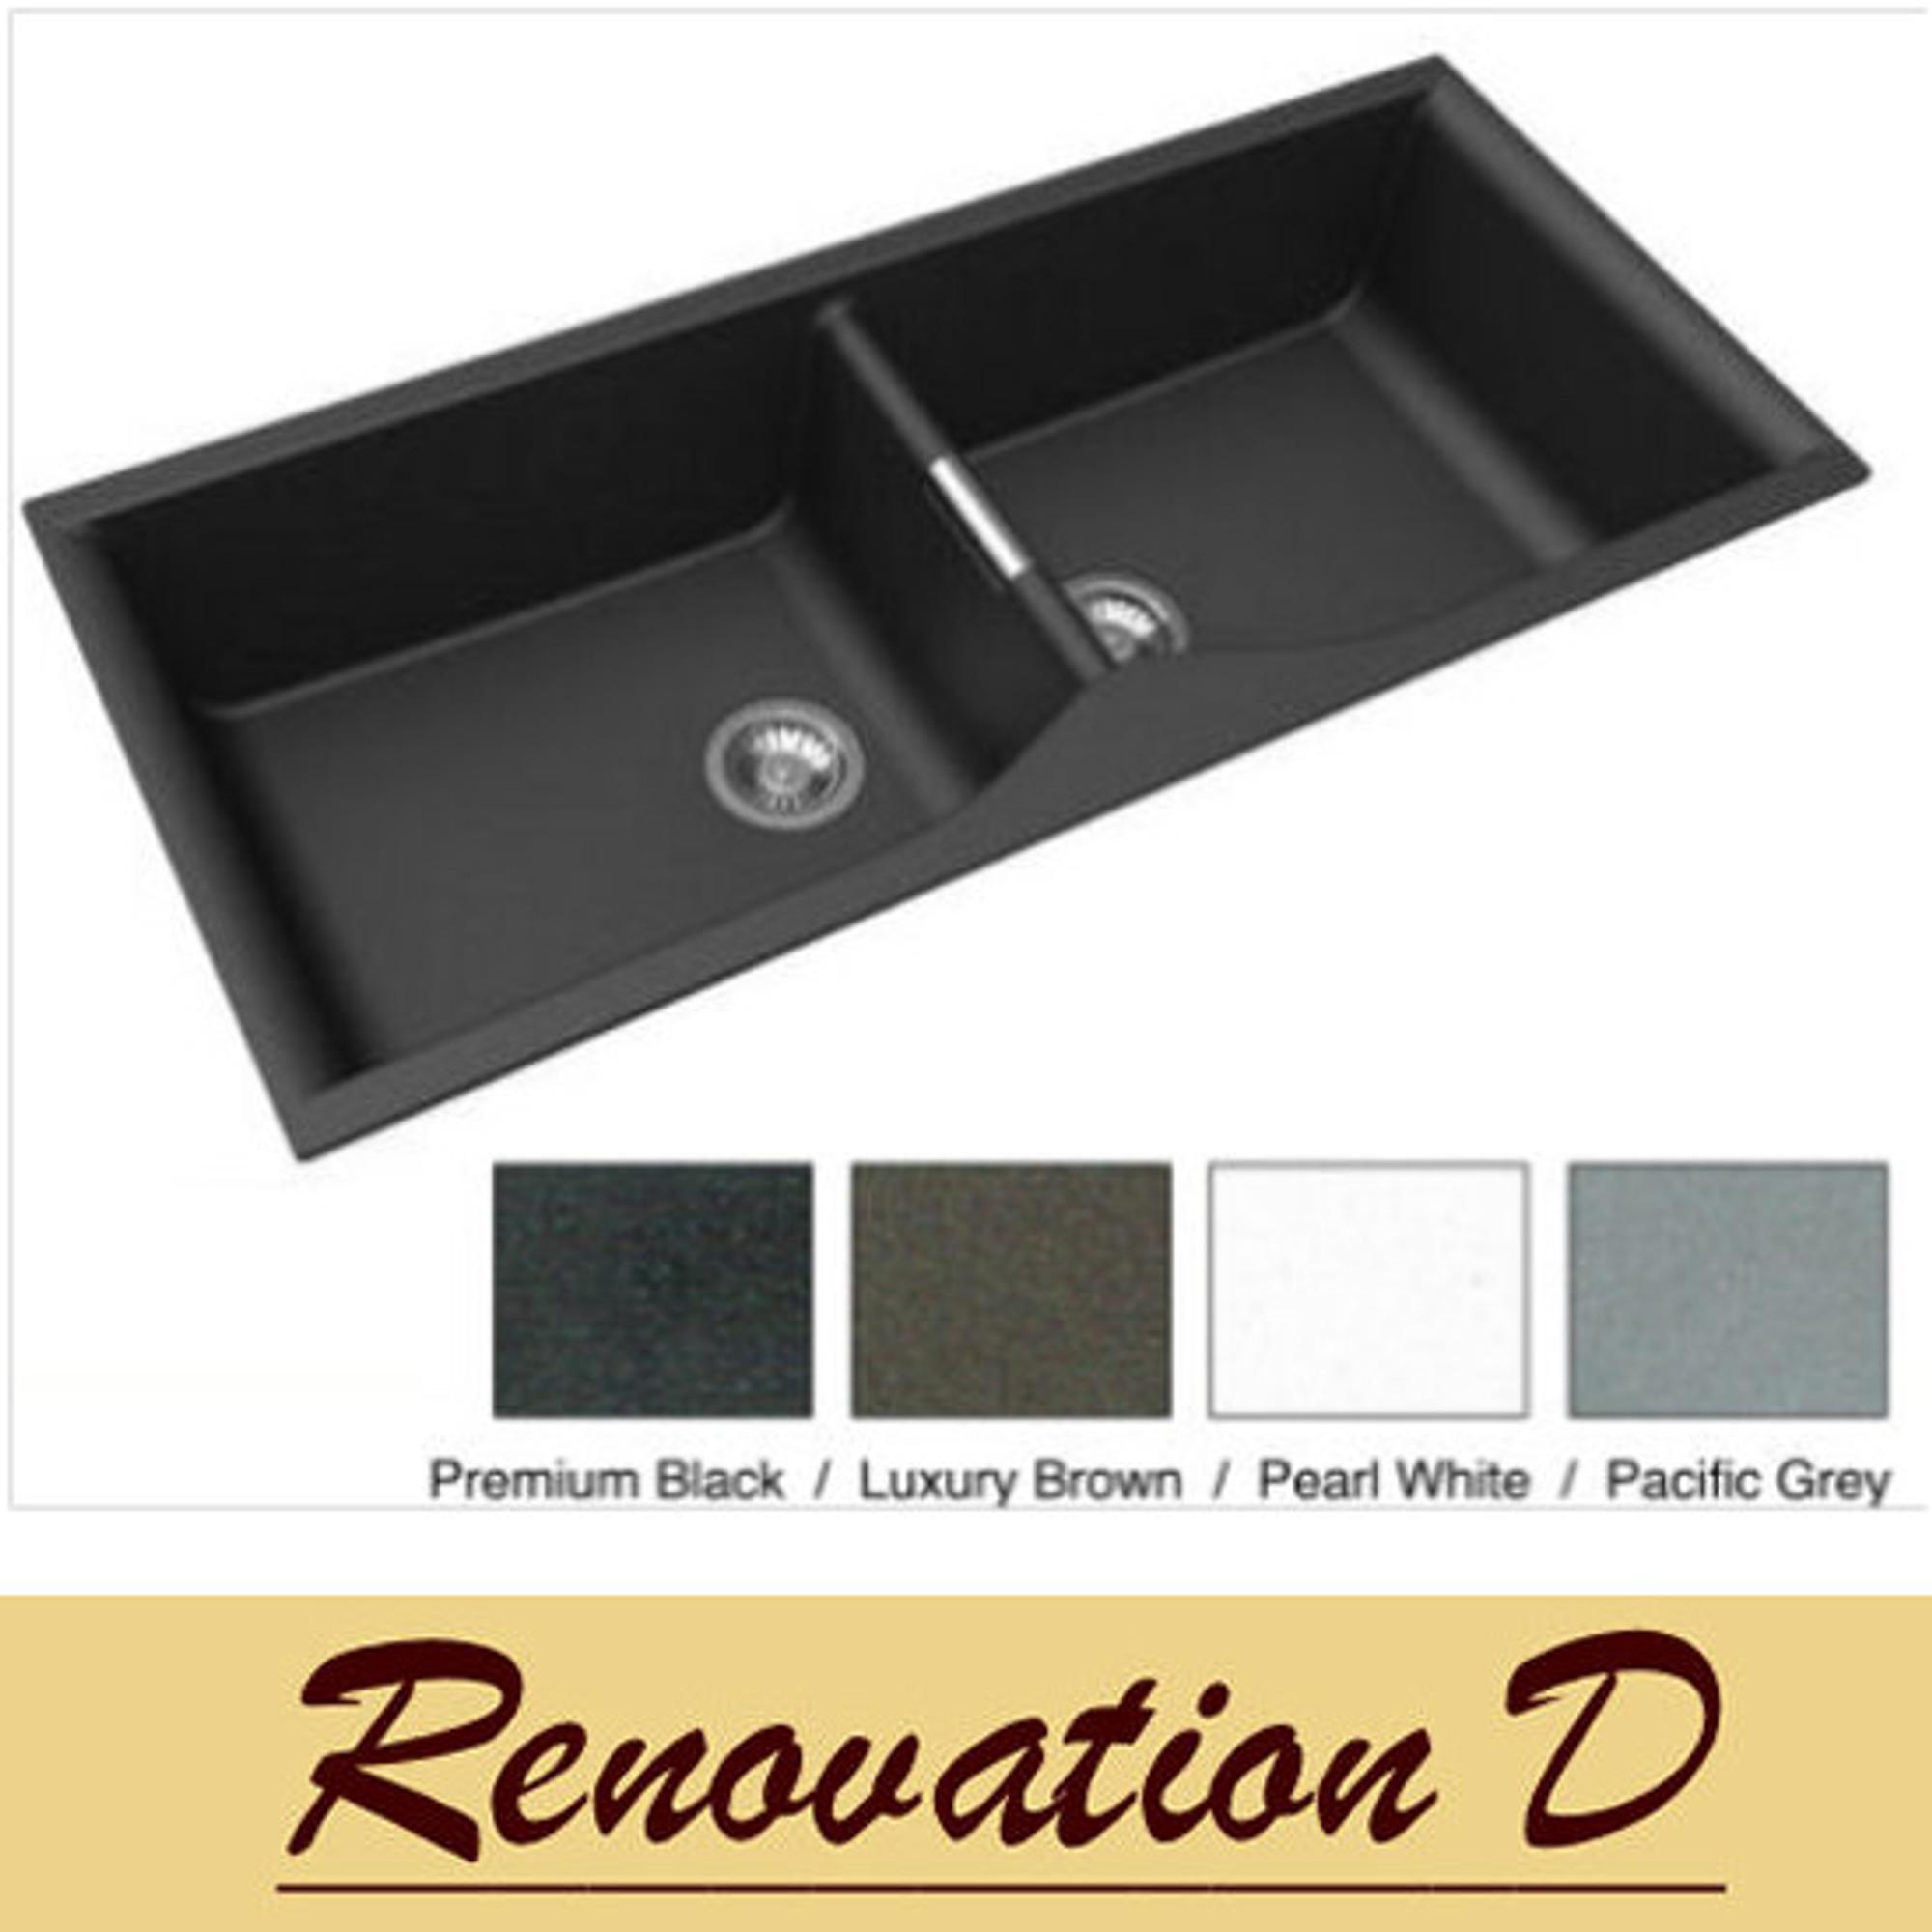 Zum Granite Kitchen Sink Double Bowl 1140mm X 500mm Renovation D